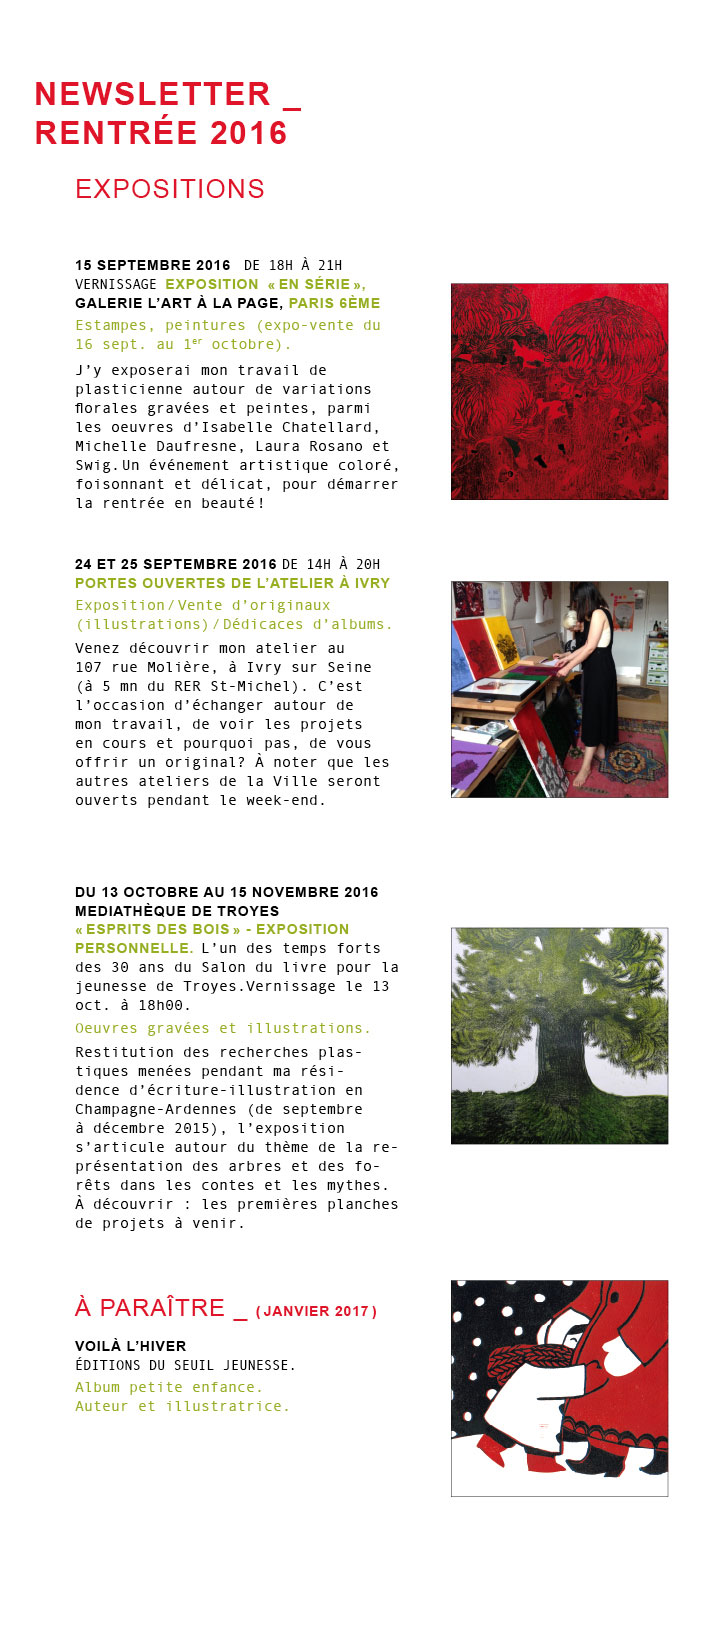 newsletter_rentree16_web